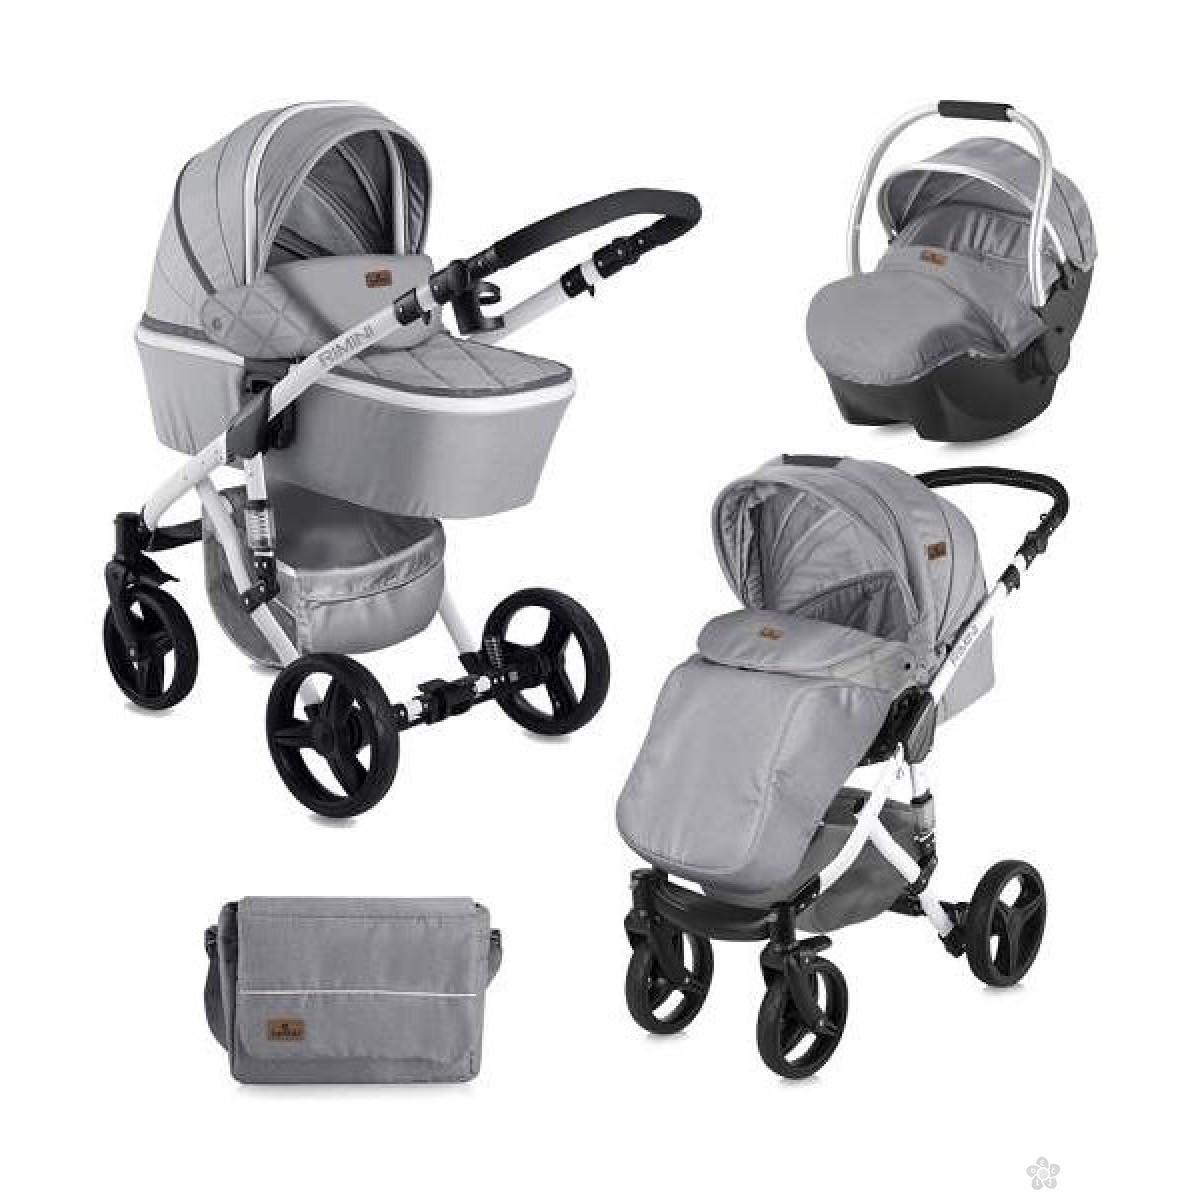 Kolica Rimini set Grey, 10021051838A